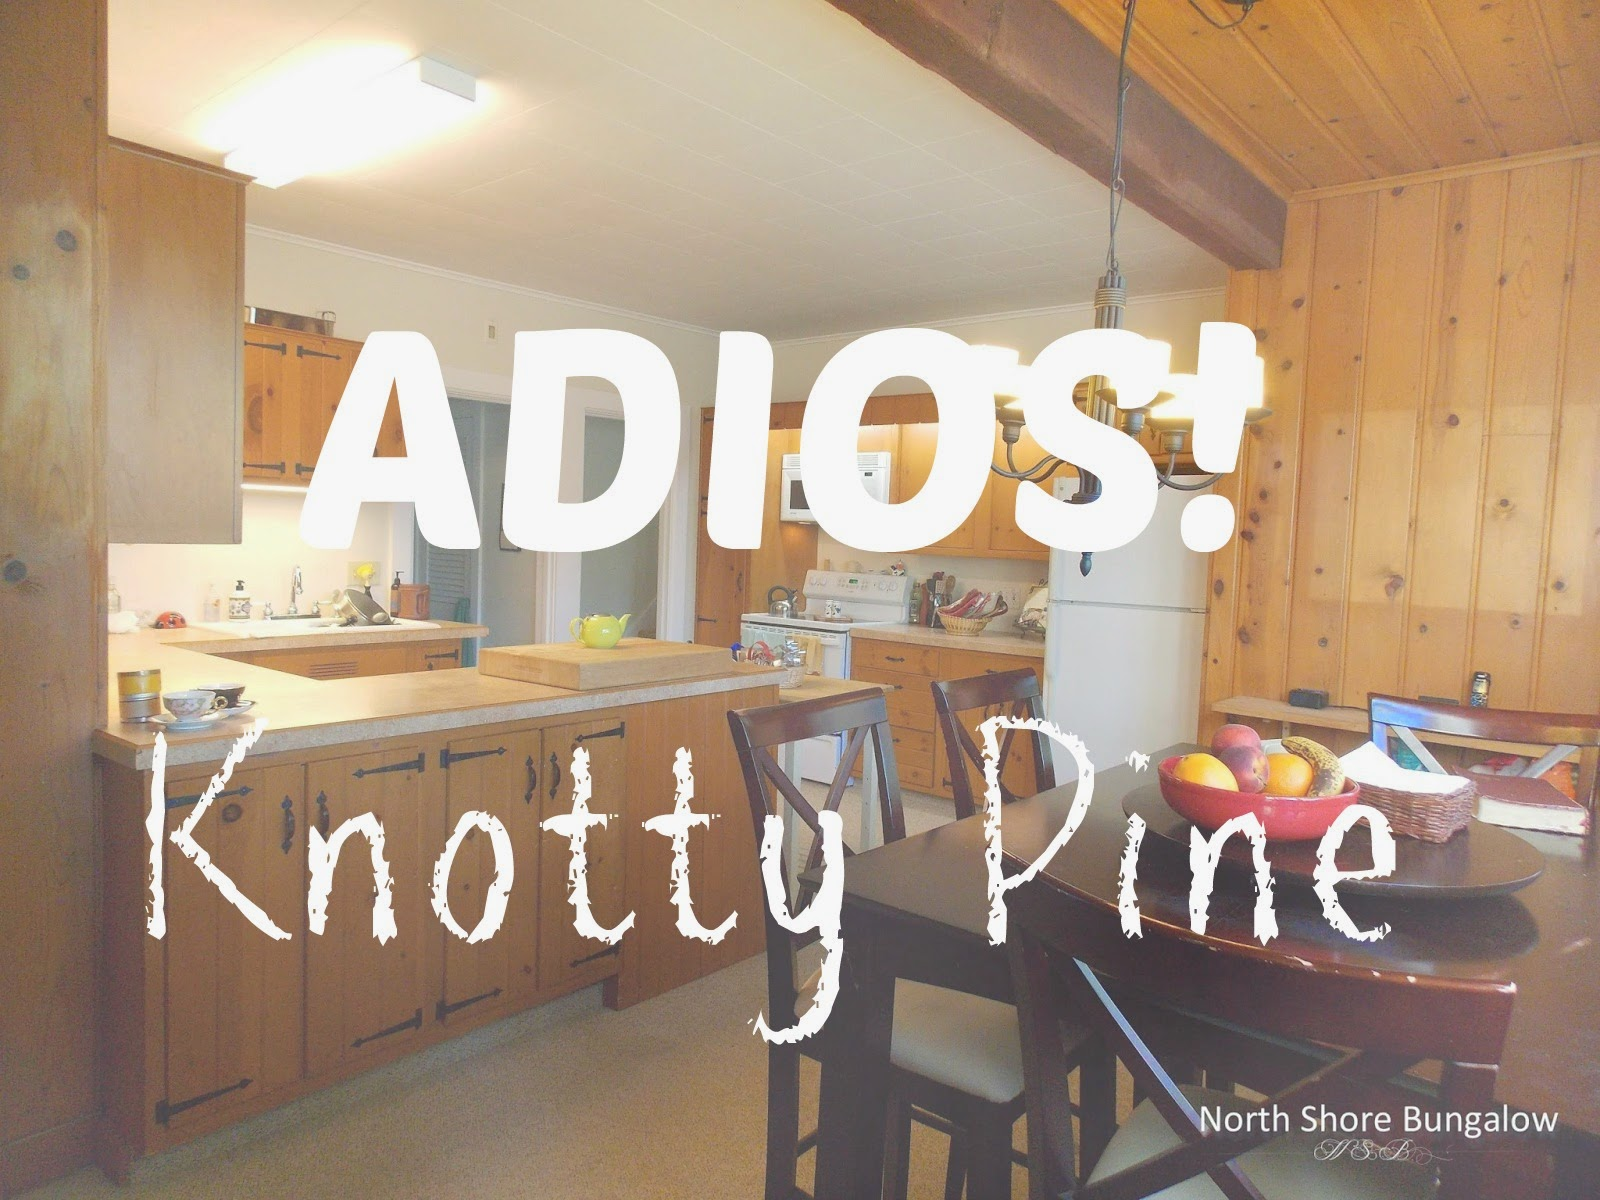 http://northshorebungalow.blogspot.com/2014/07/adios-knotty-pine.html